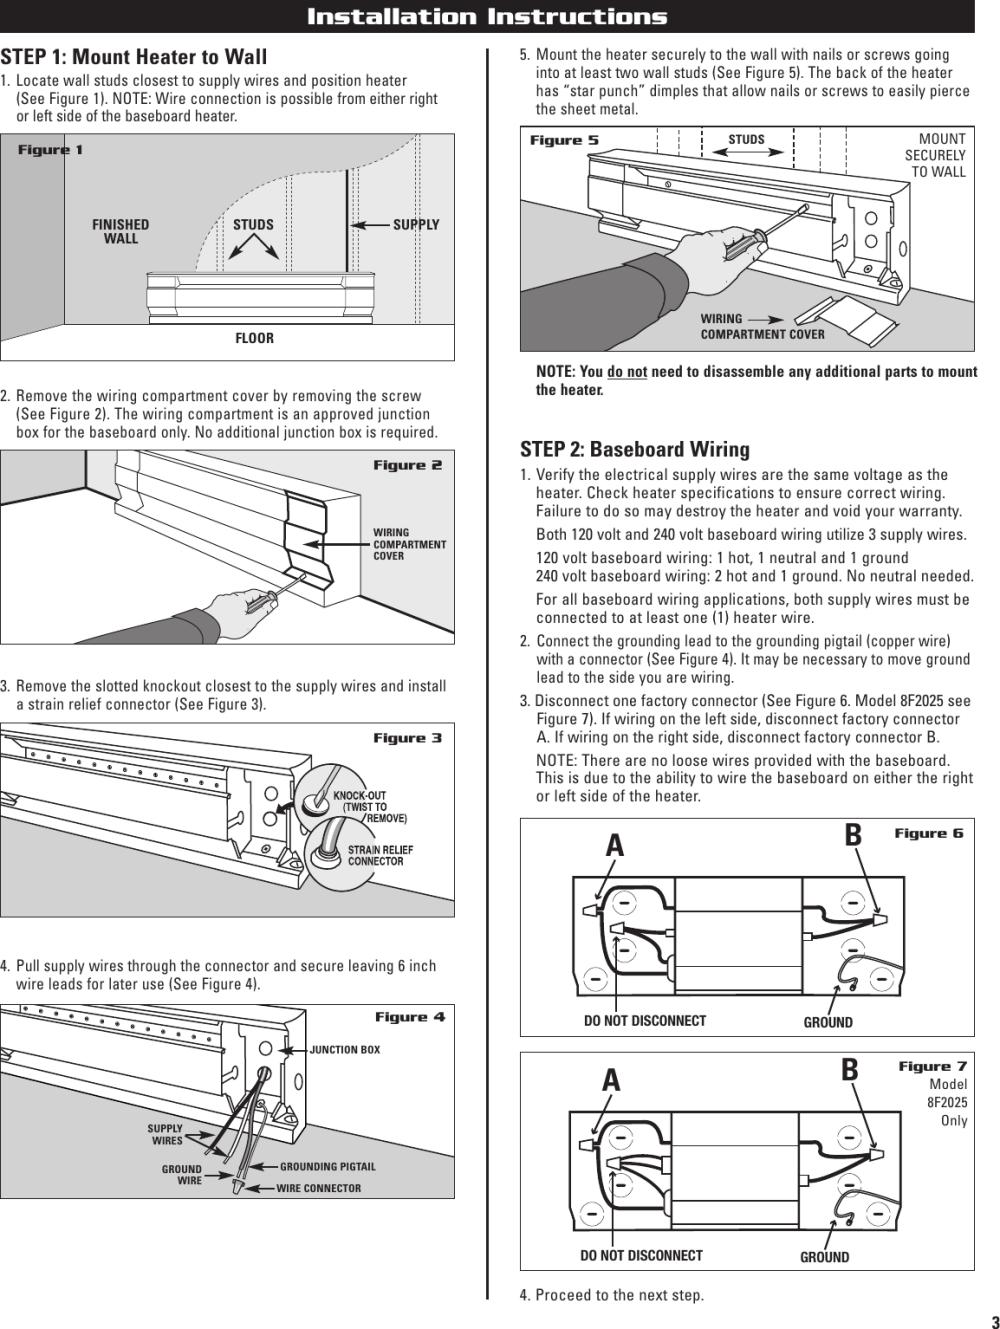 medium resolution of page 3 of 12 cadet cadet 10f2500 users manual 720001